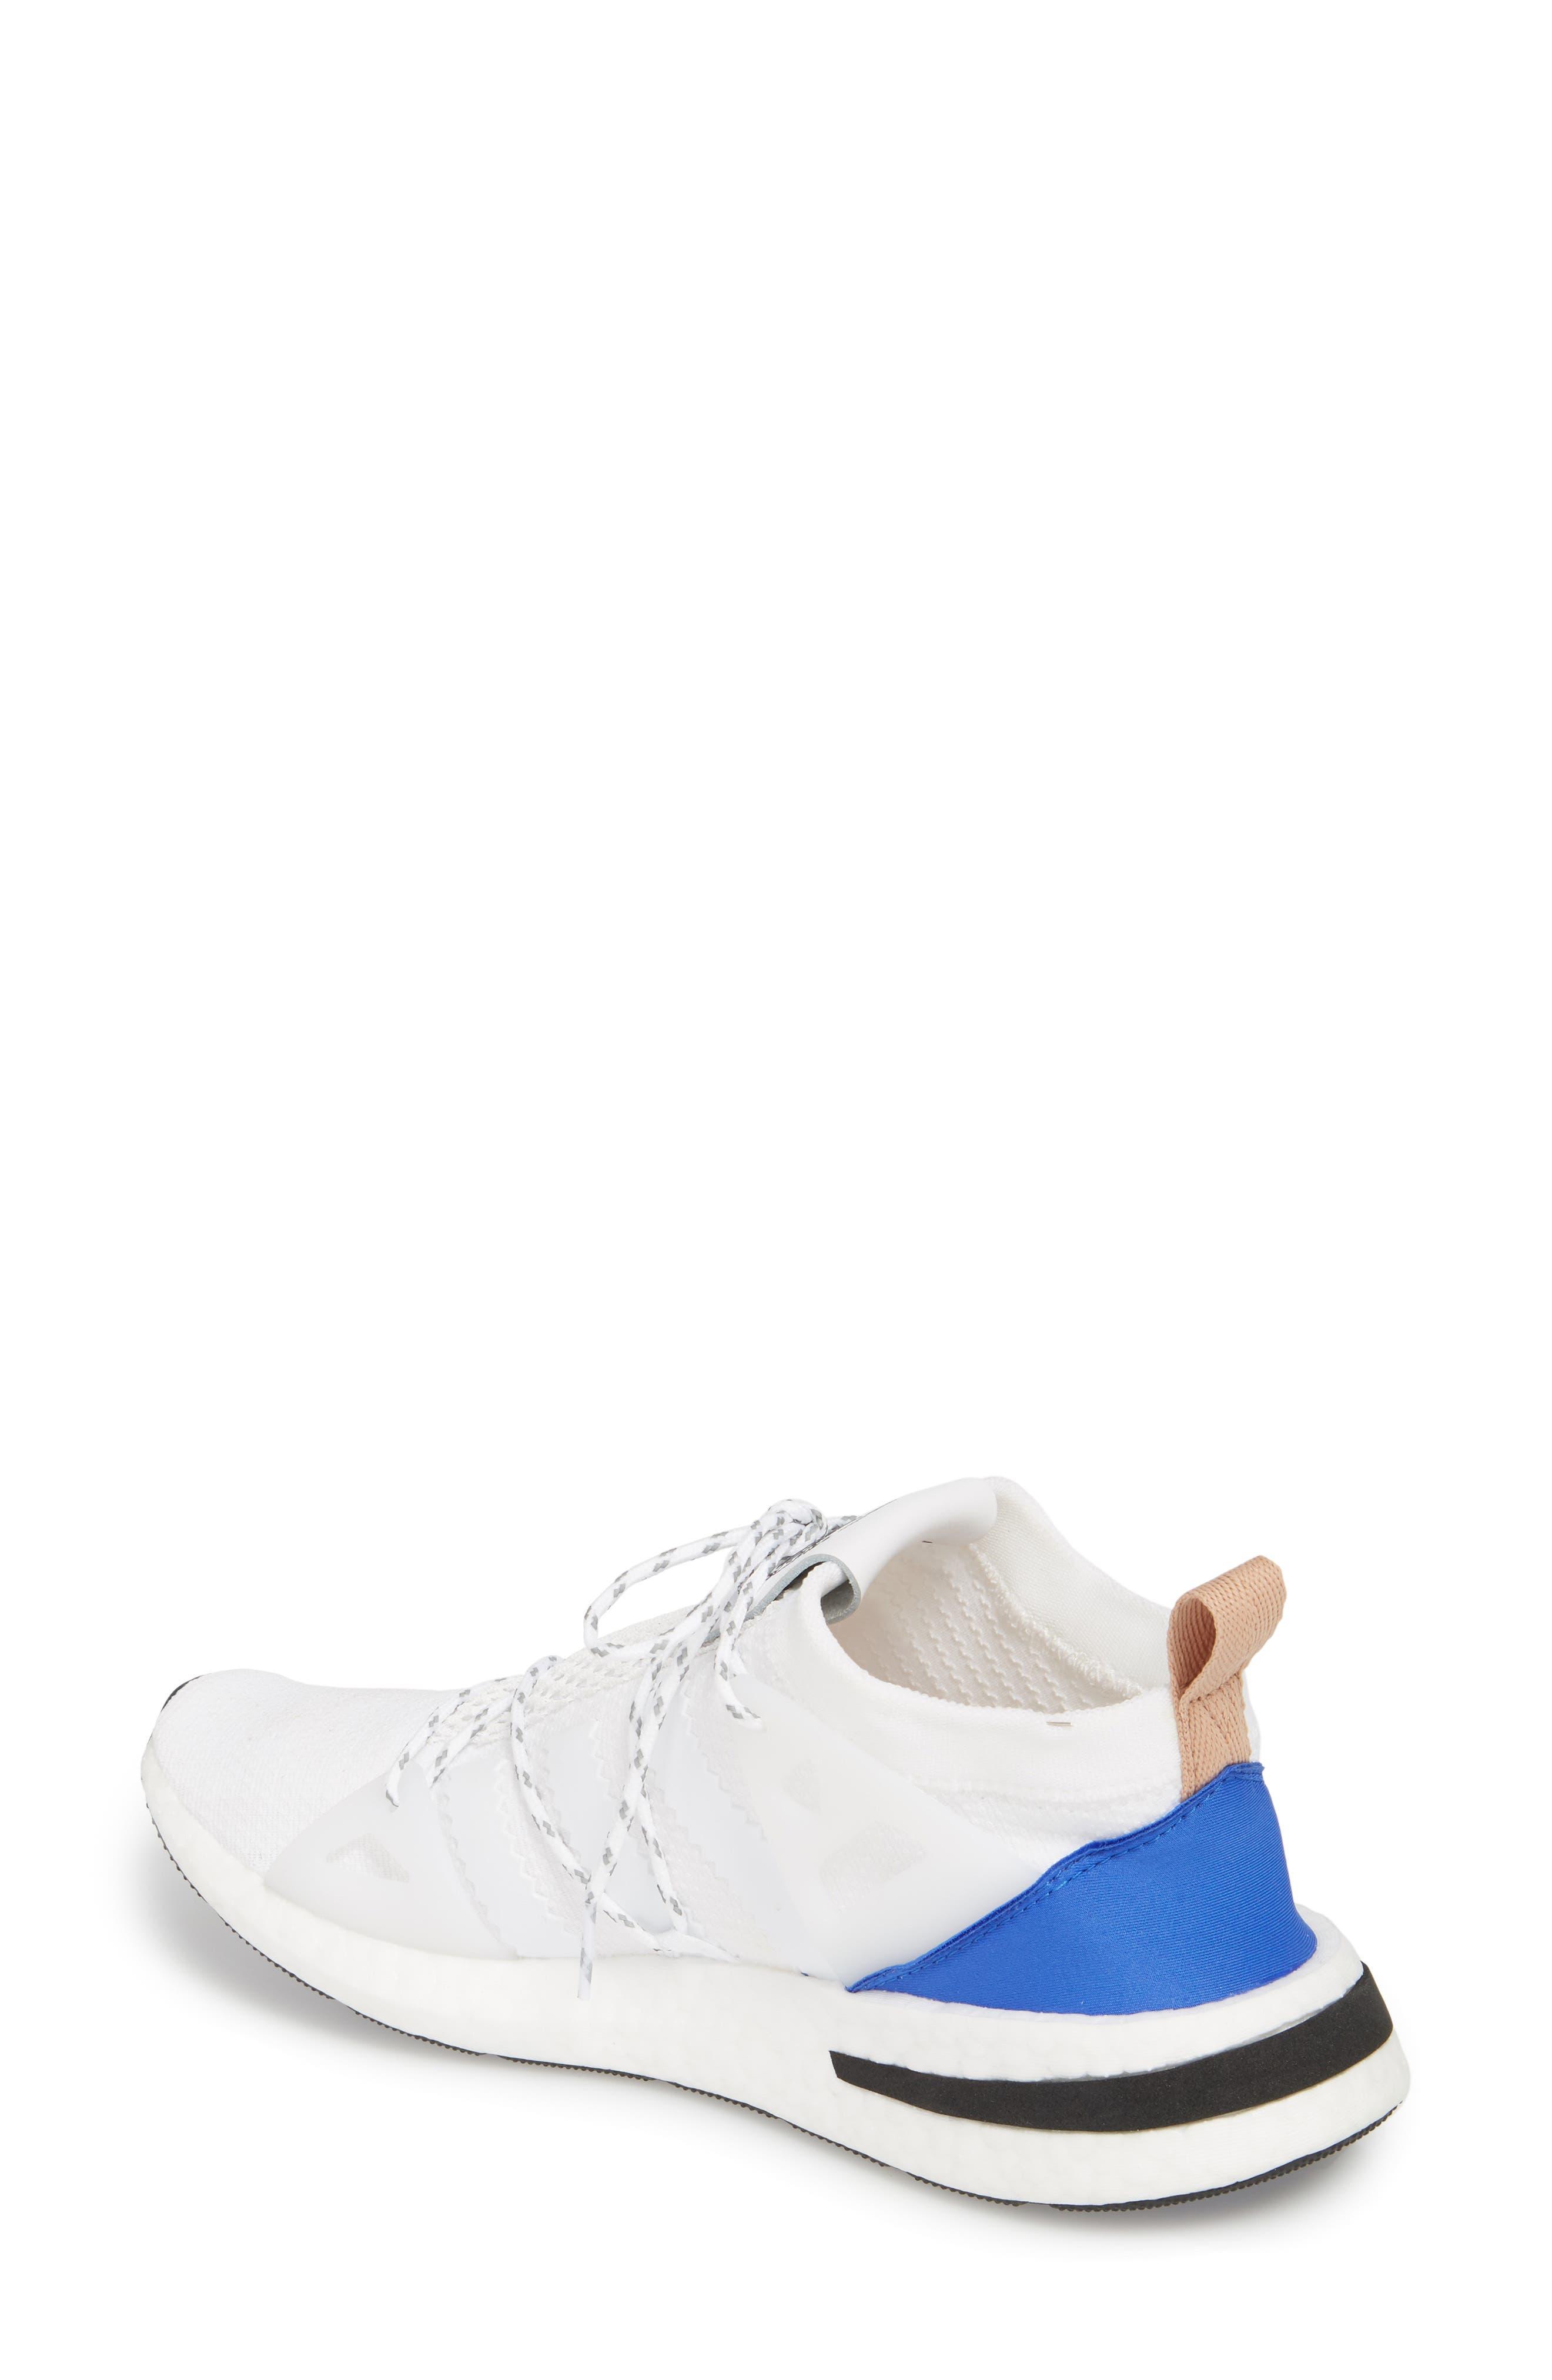 Arkyn Sneaker,                             Alternate thumbnail 2, color,                             White/ White/ Ash Pearl